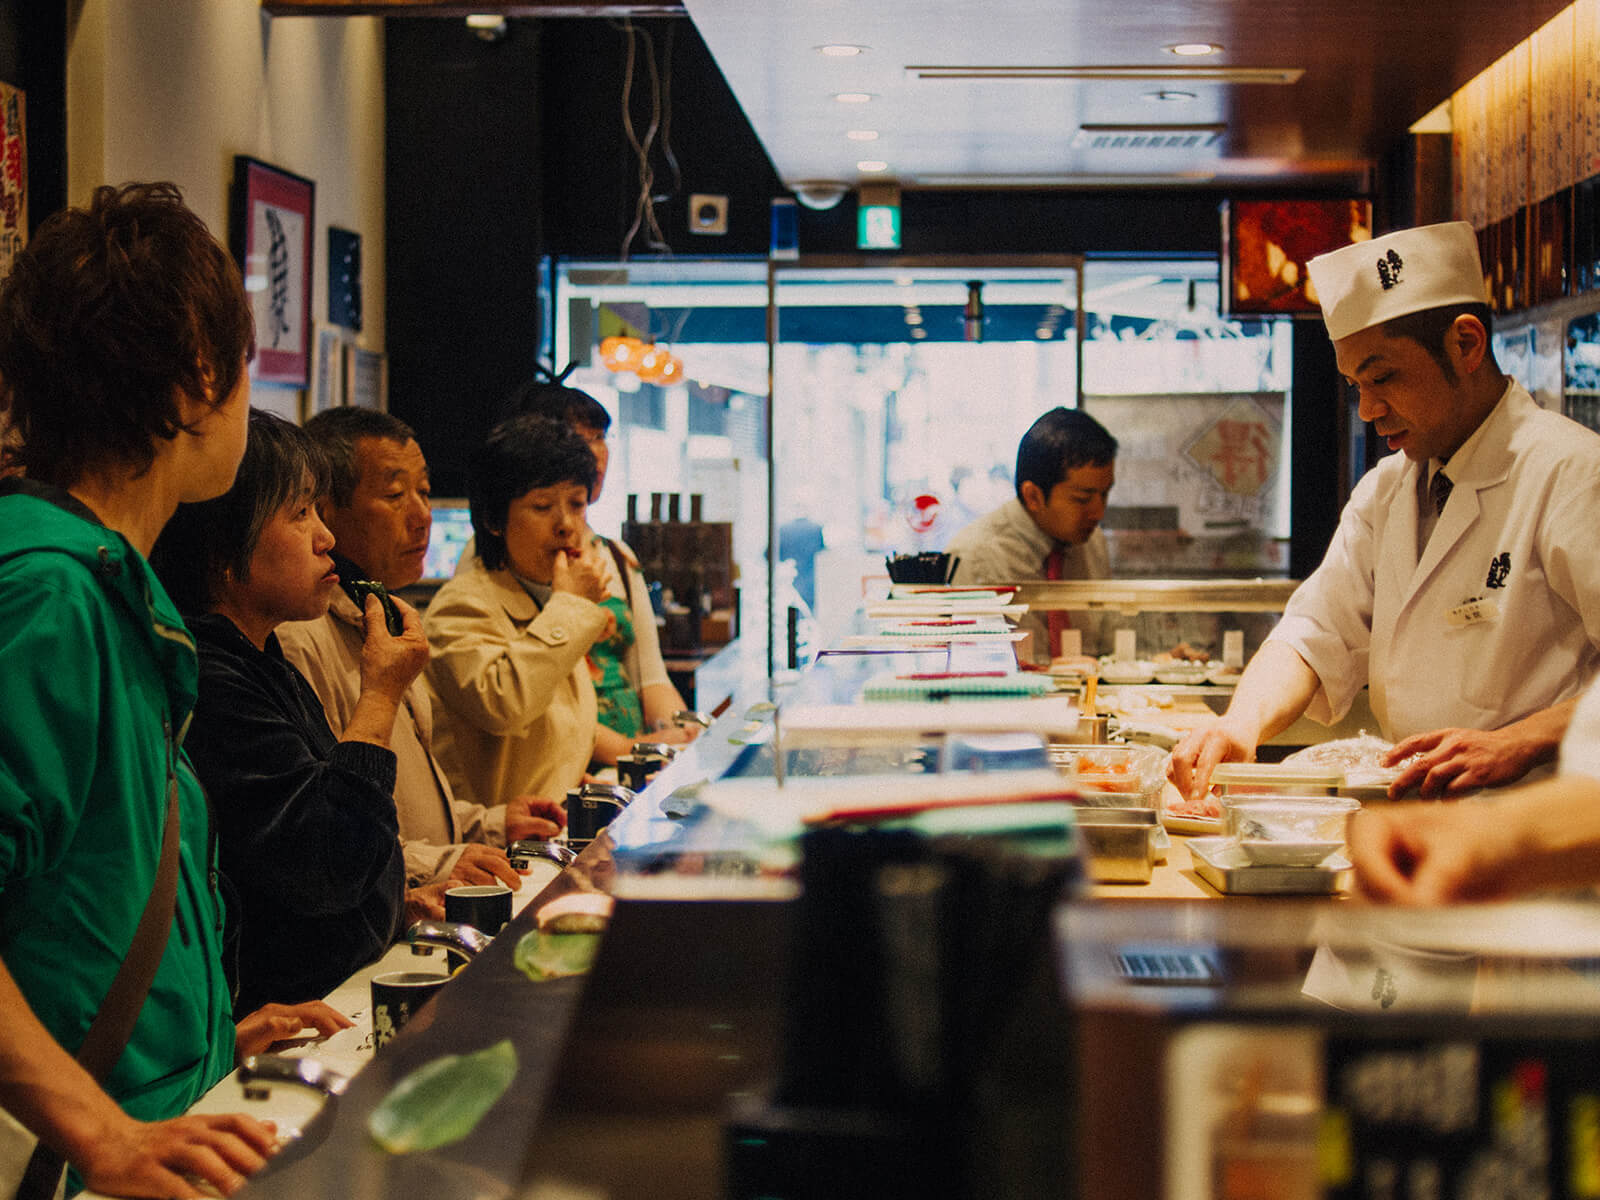 суши-бар 1